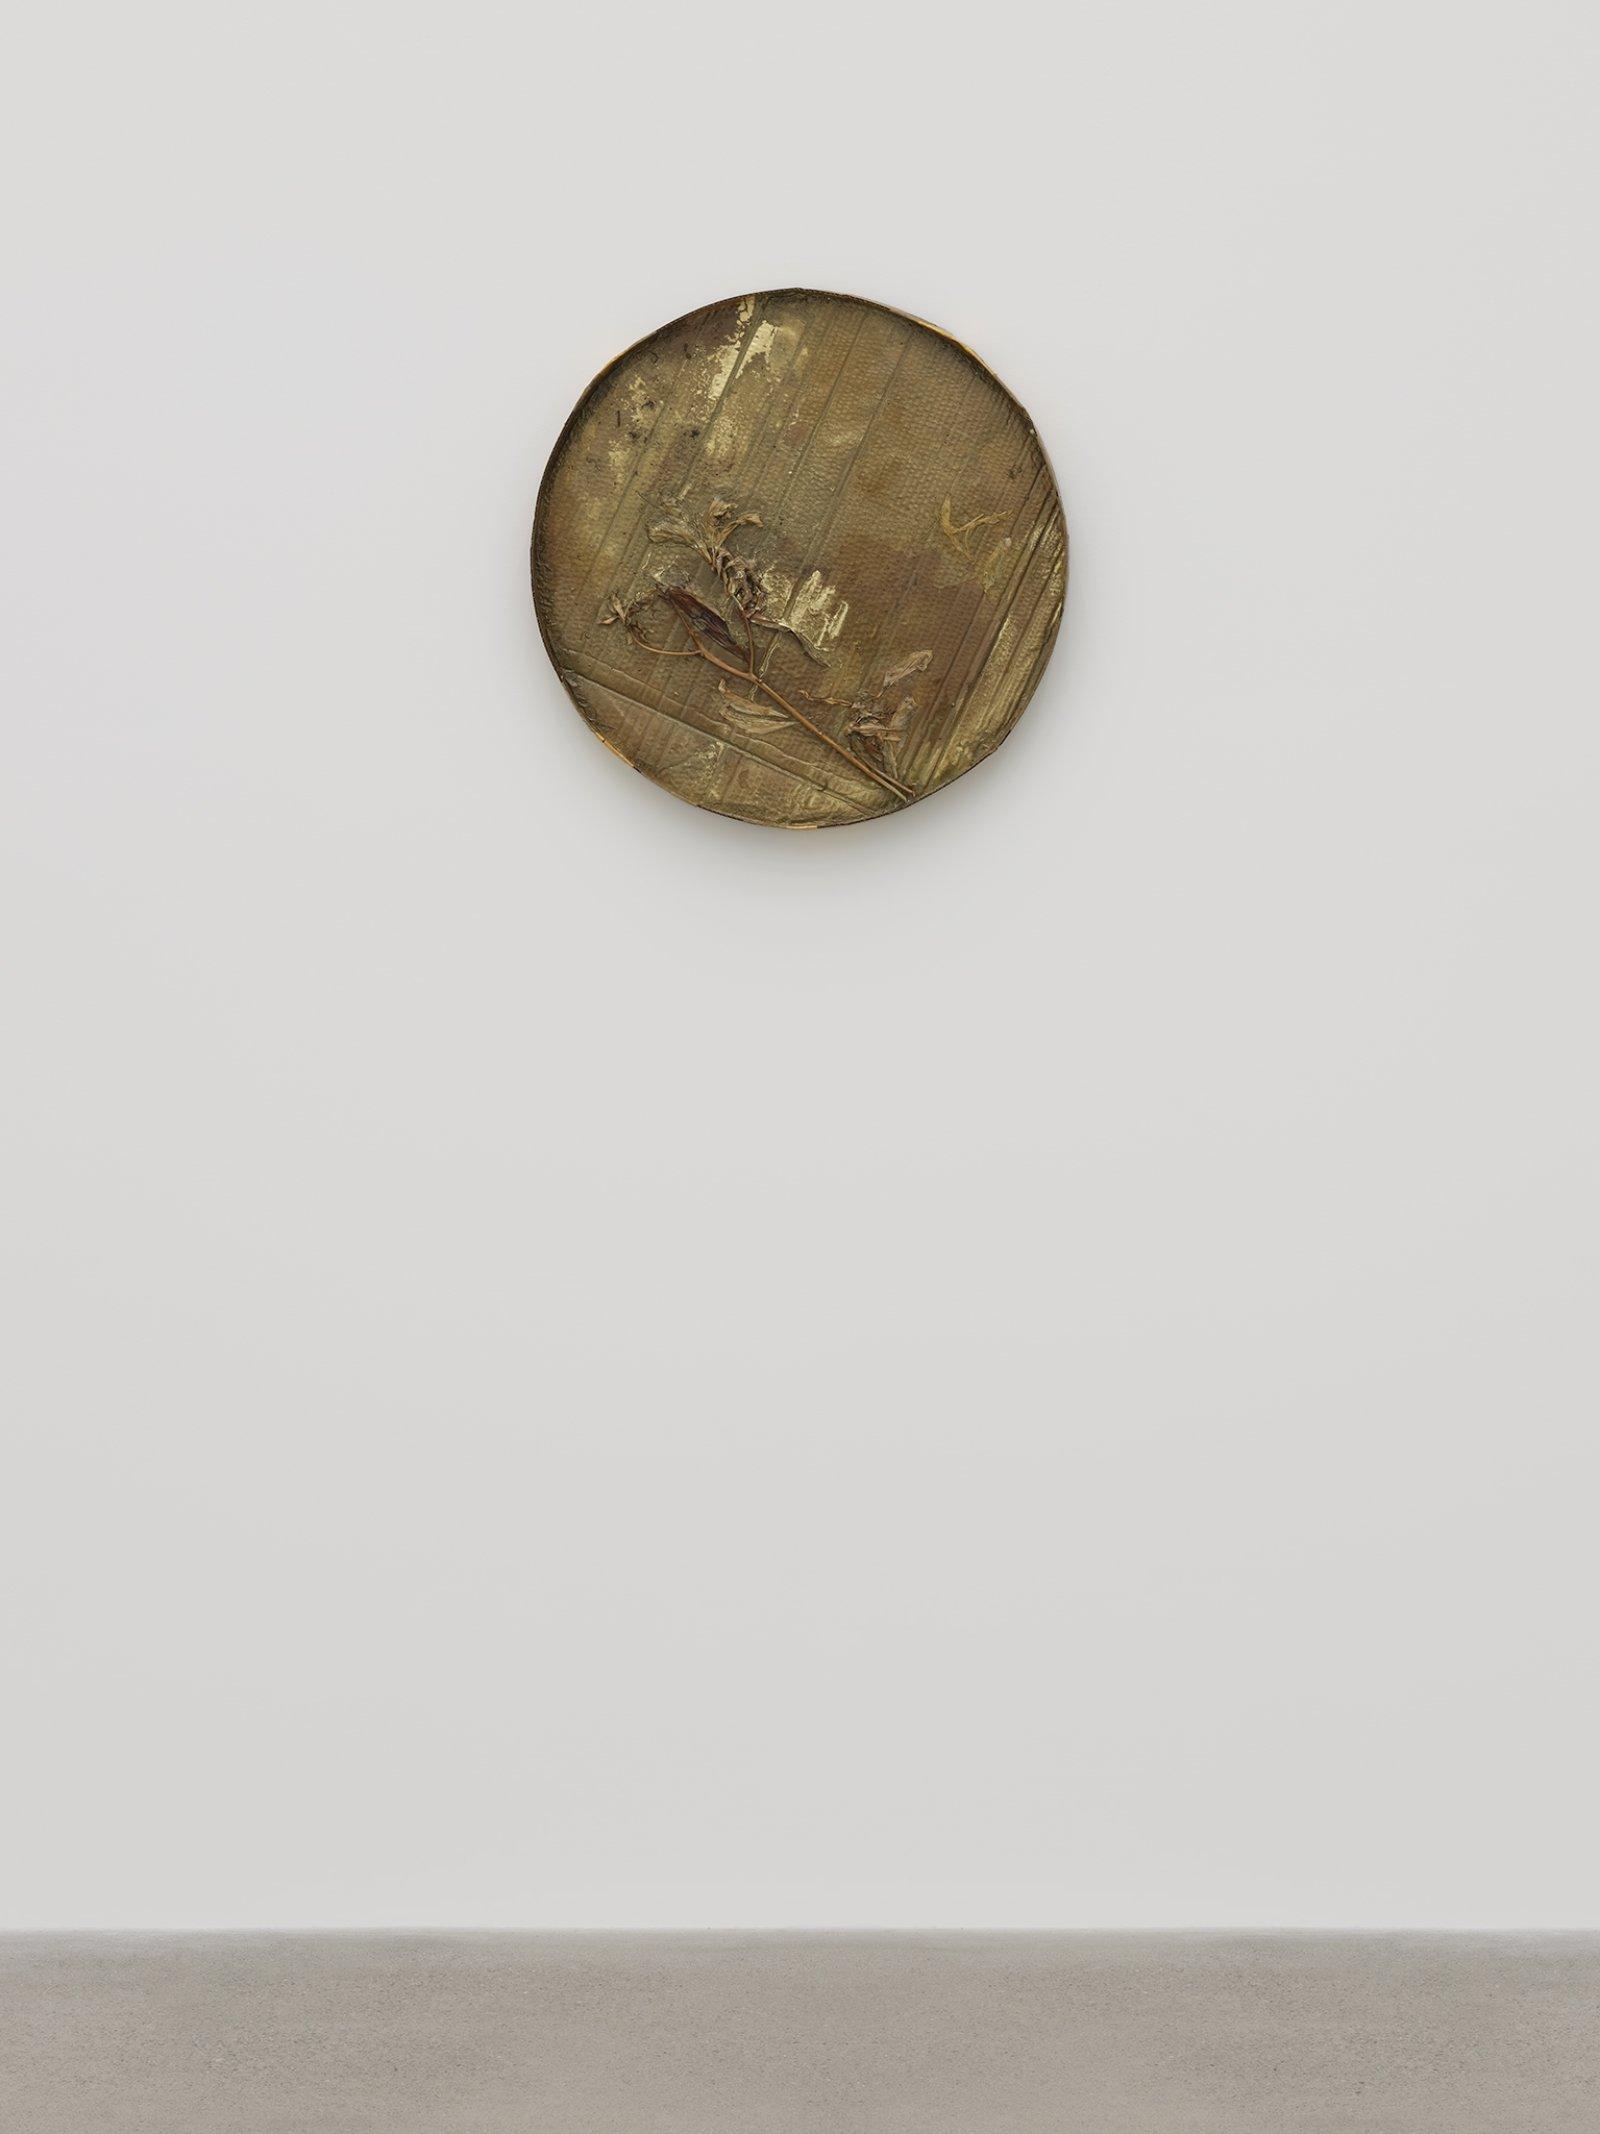 Rochelle Goldberg, Halo I, 2019, cardboard, tissue paper, lilies, shellac, gold pigment, gold tape, dirt, 27 x 27 x 3 in. (67 x 67 x 6 cm) by Rochelle Goldberg